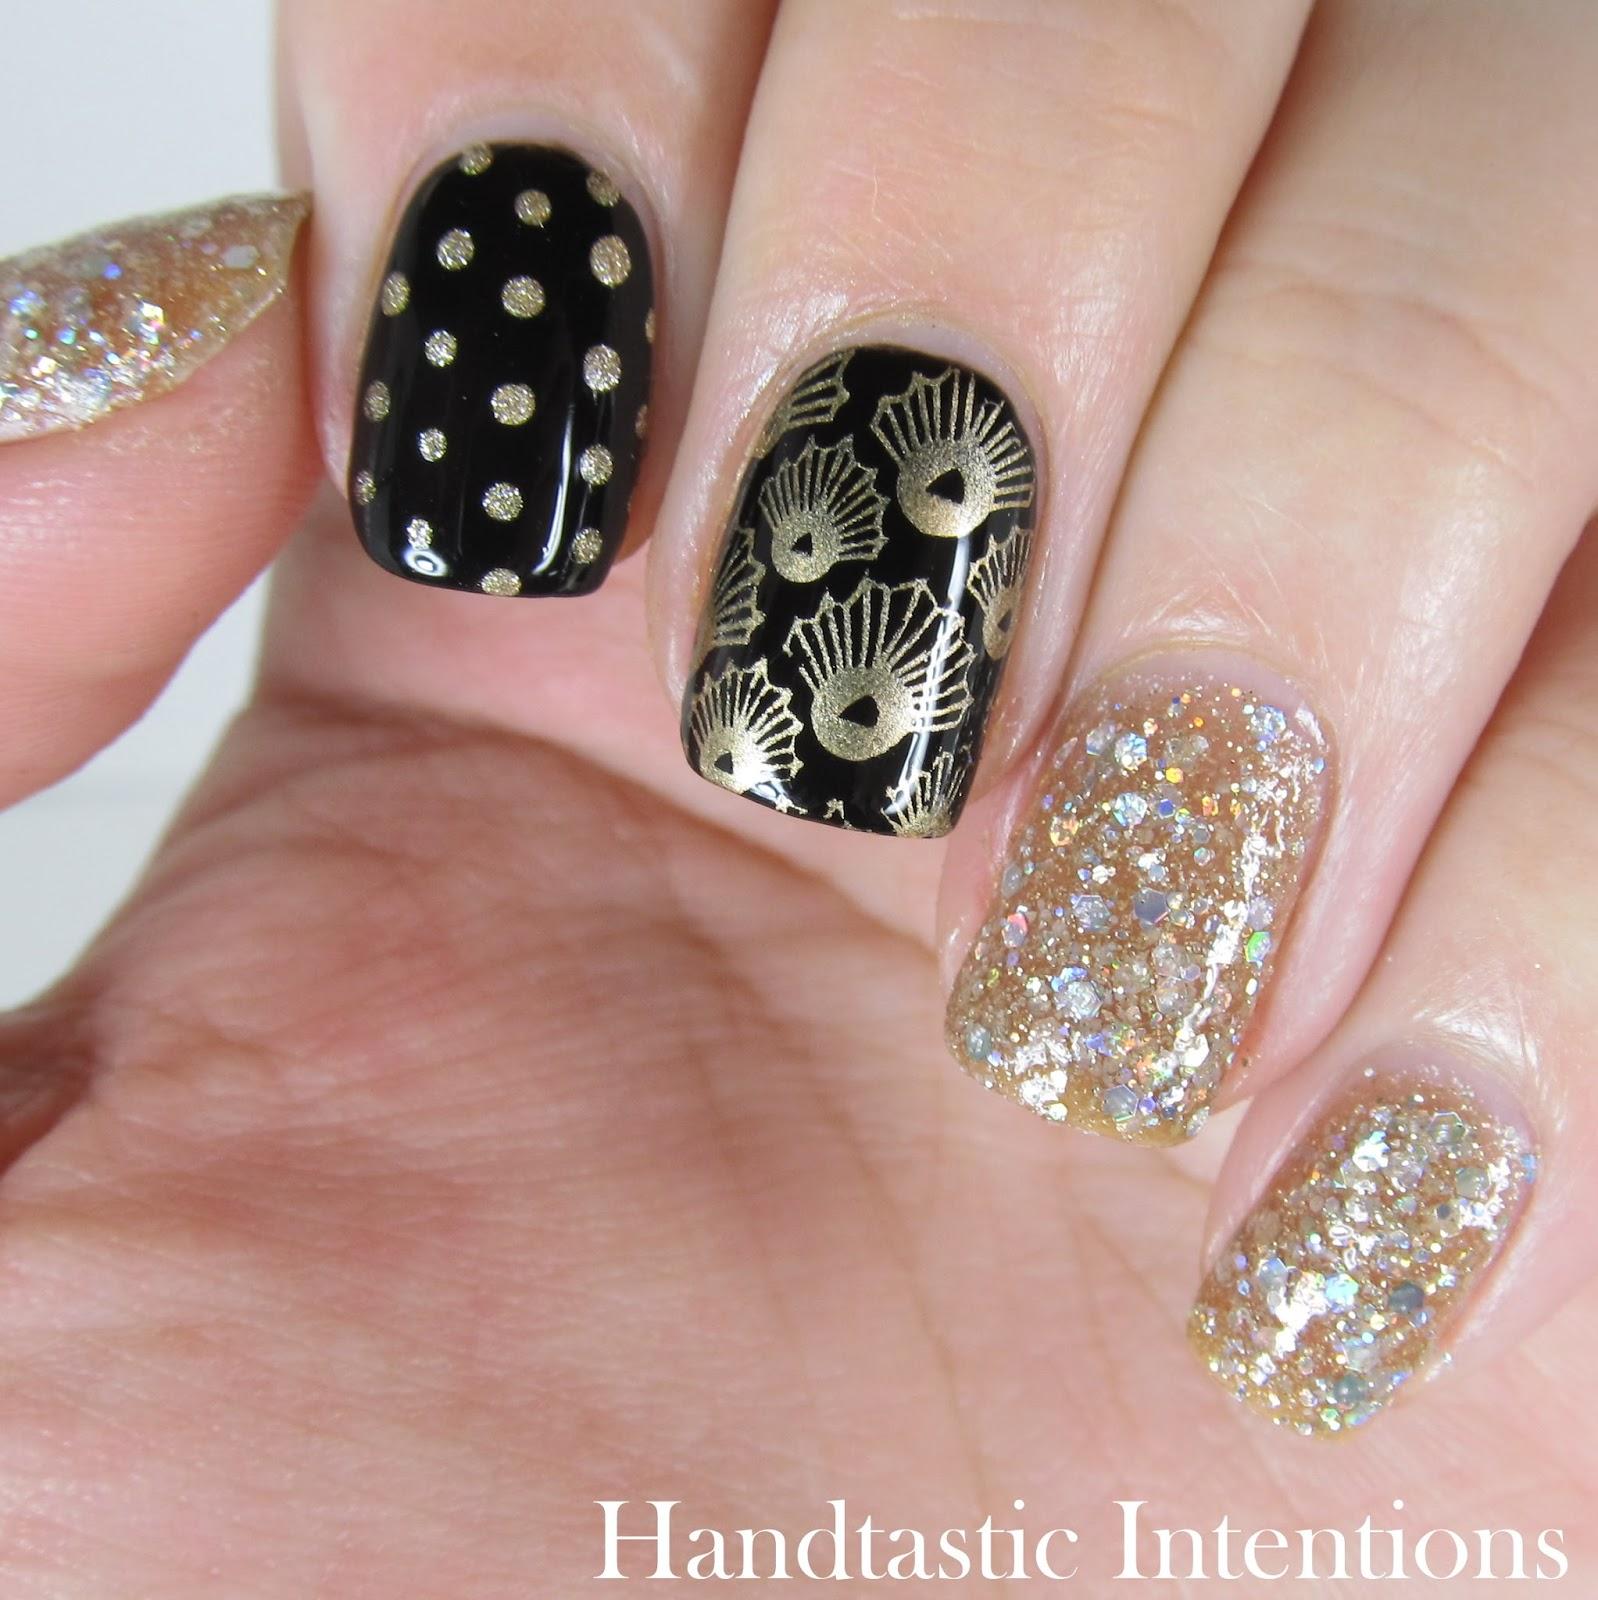 Nail designs for las vegas designs for las vegas v salon 51 photos nail salons las vegas nv yelp prinsesfo Images